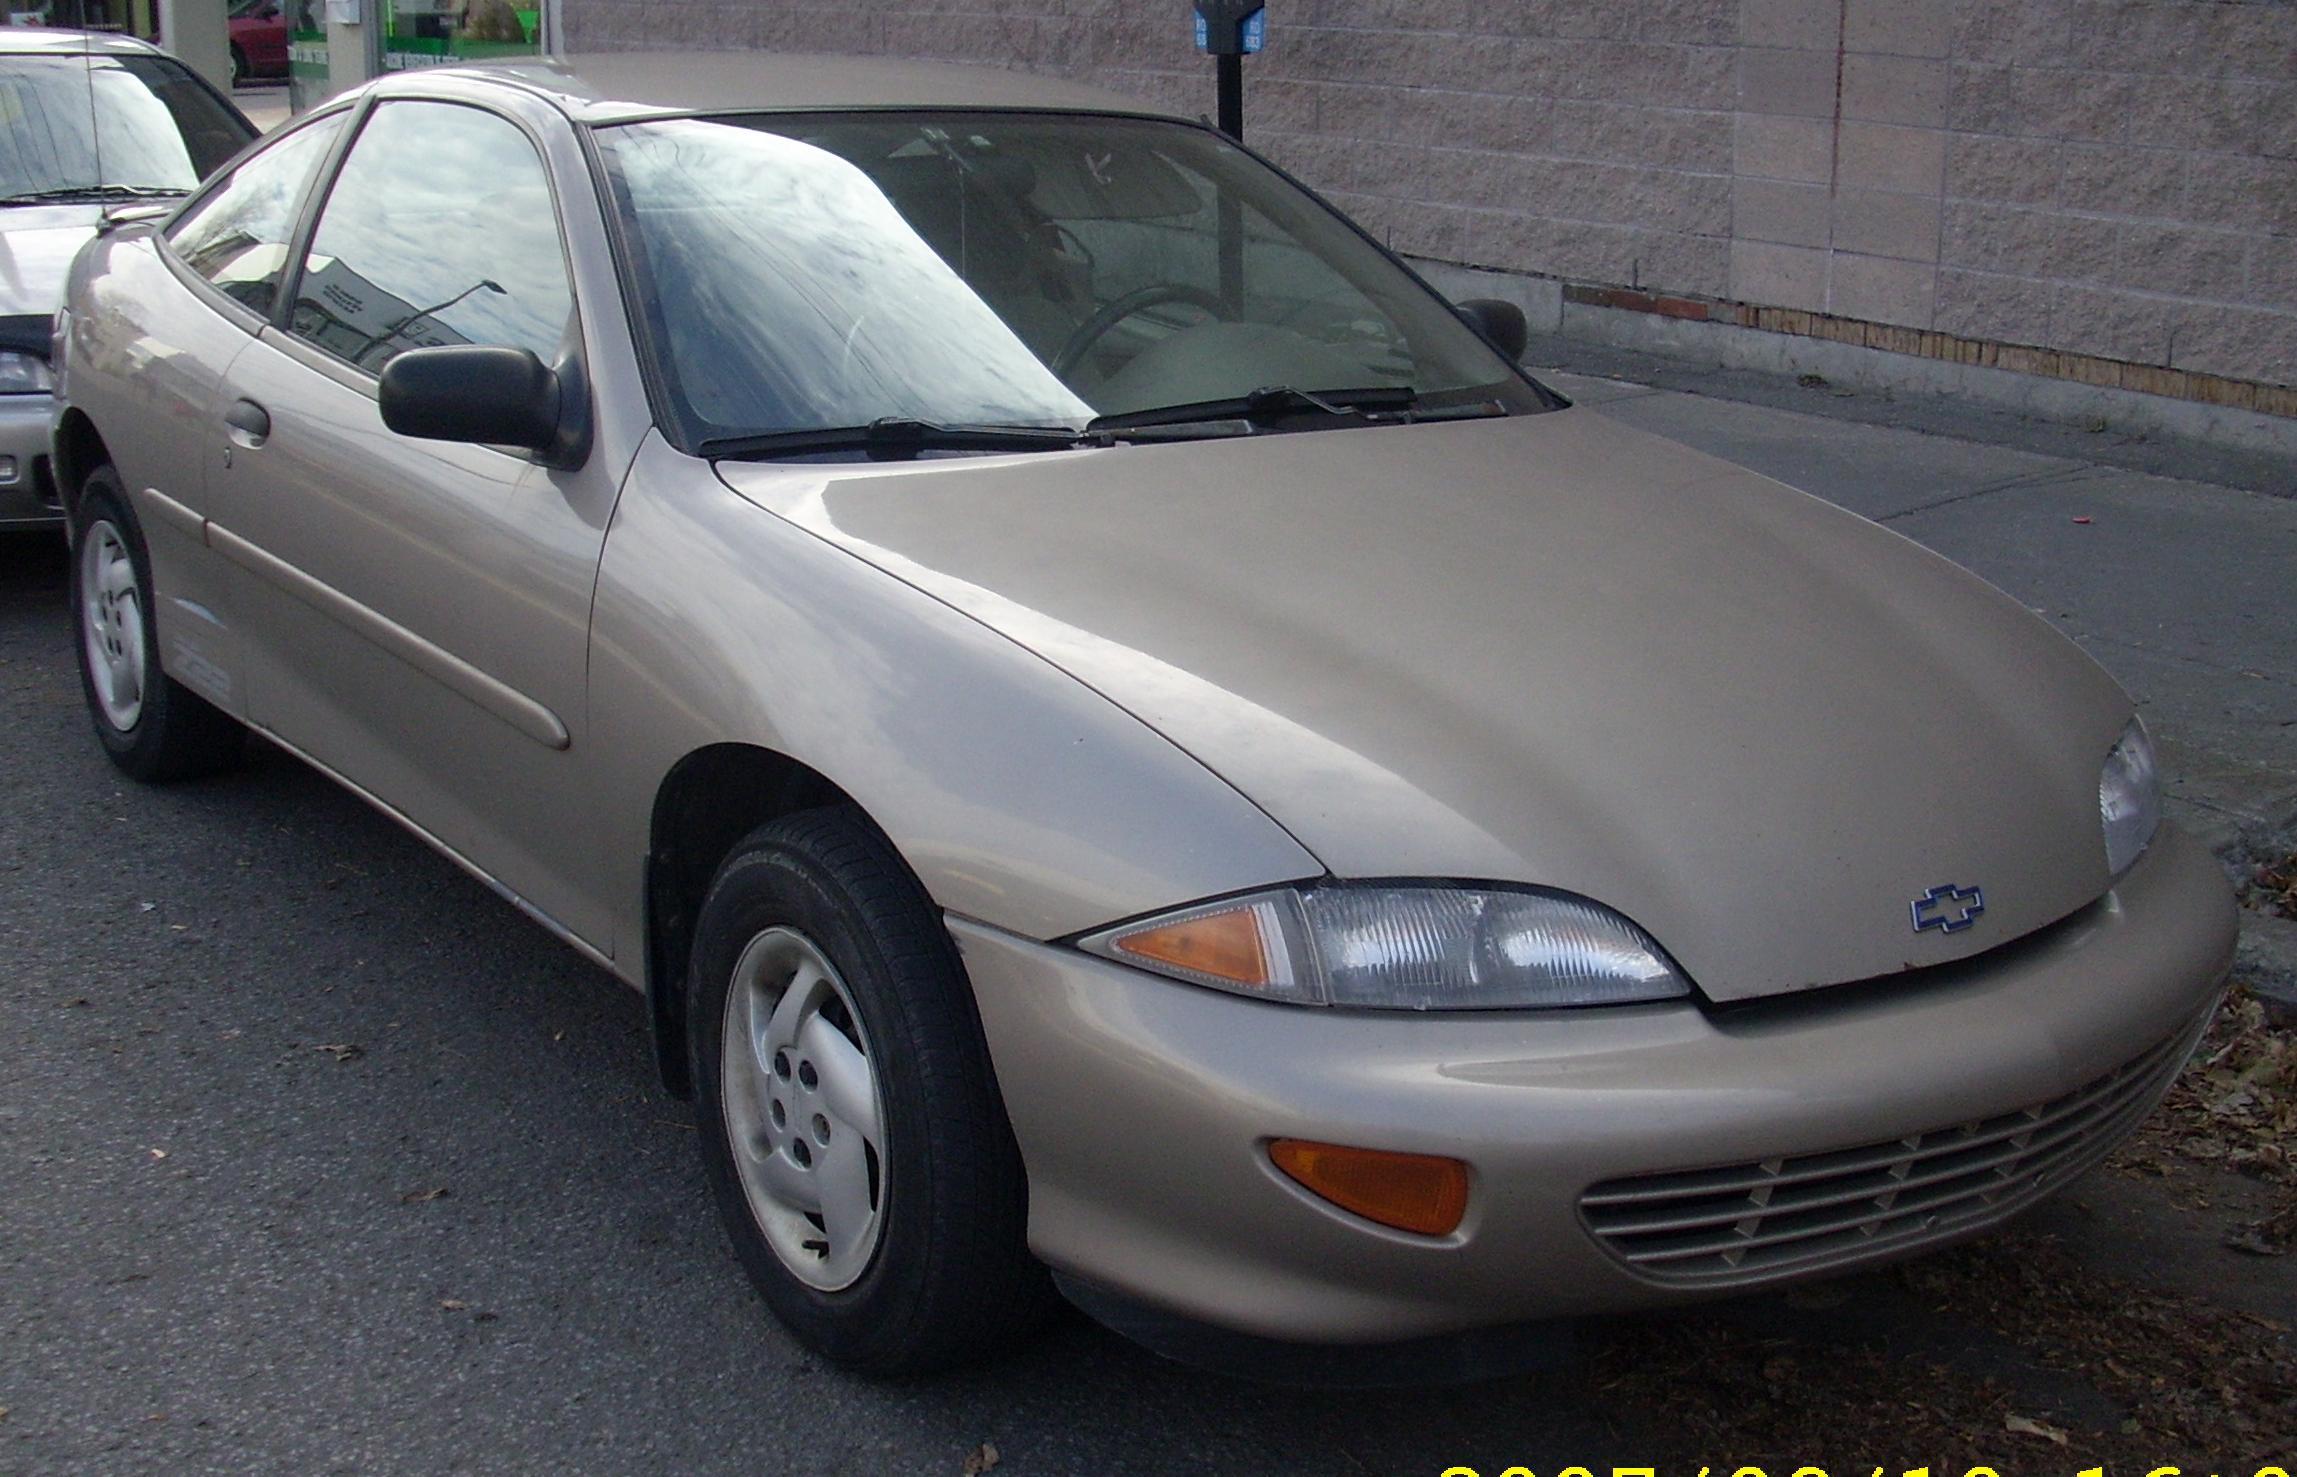 Chevrolet Cavalier Z24 Coupe Automatic (1999)